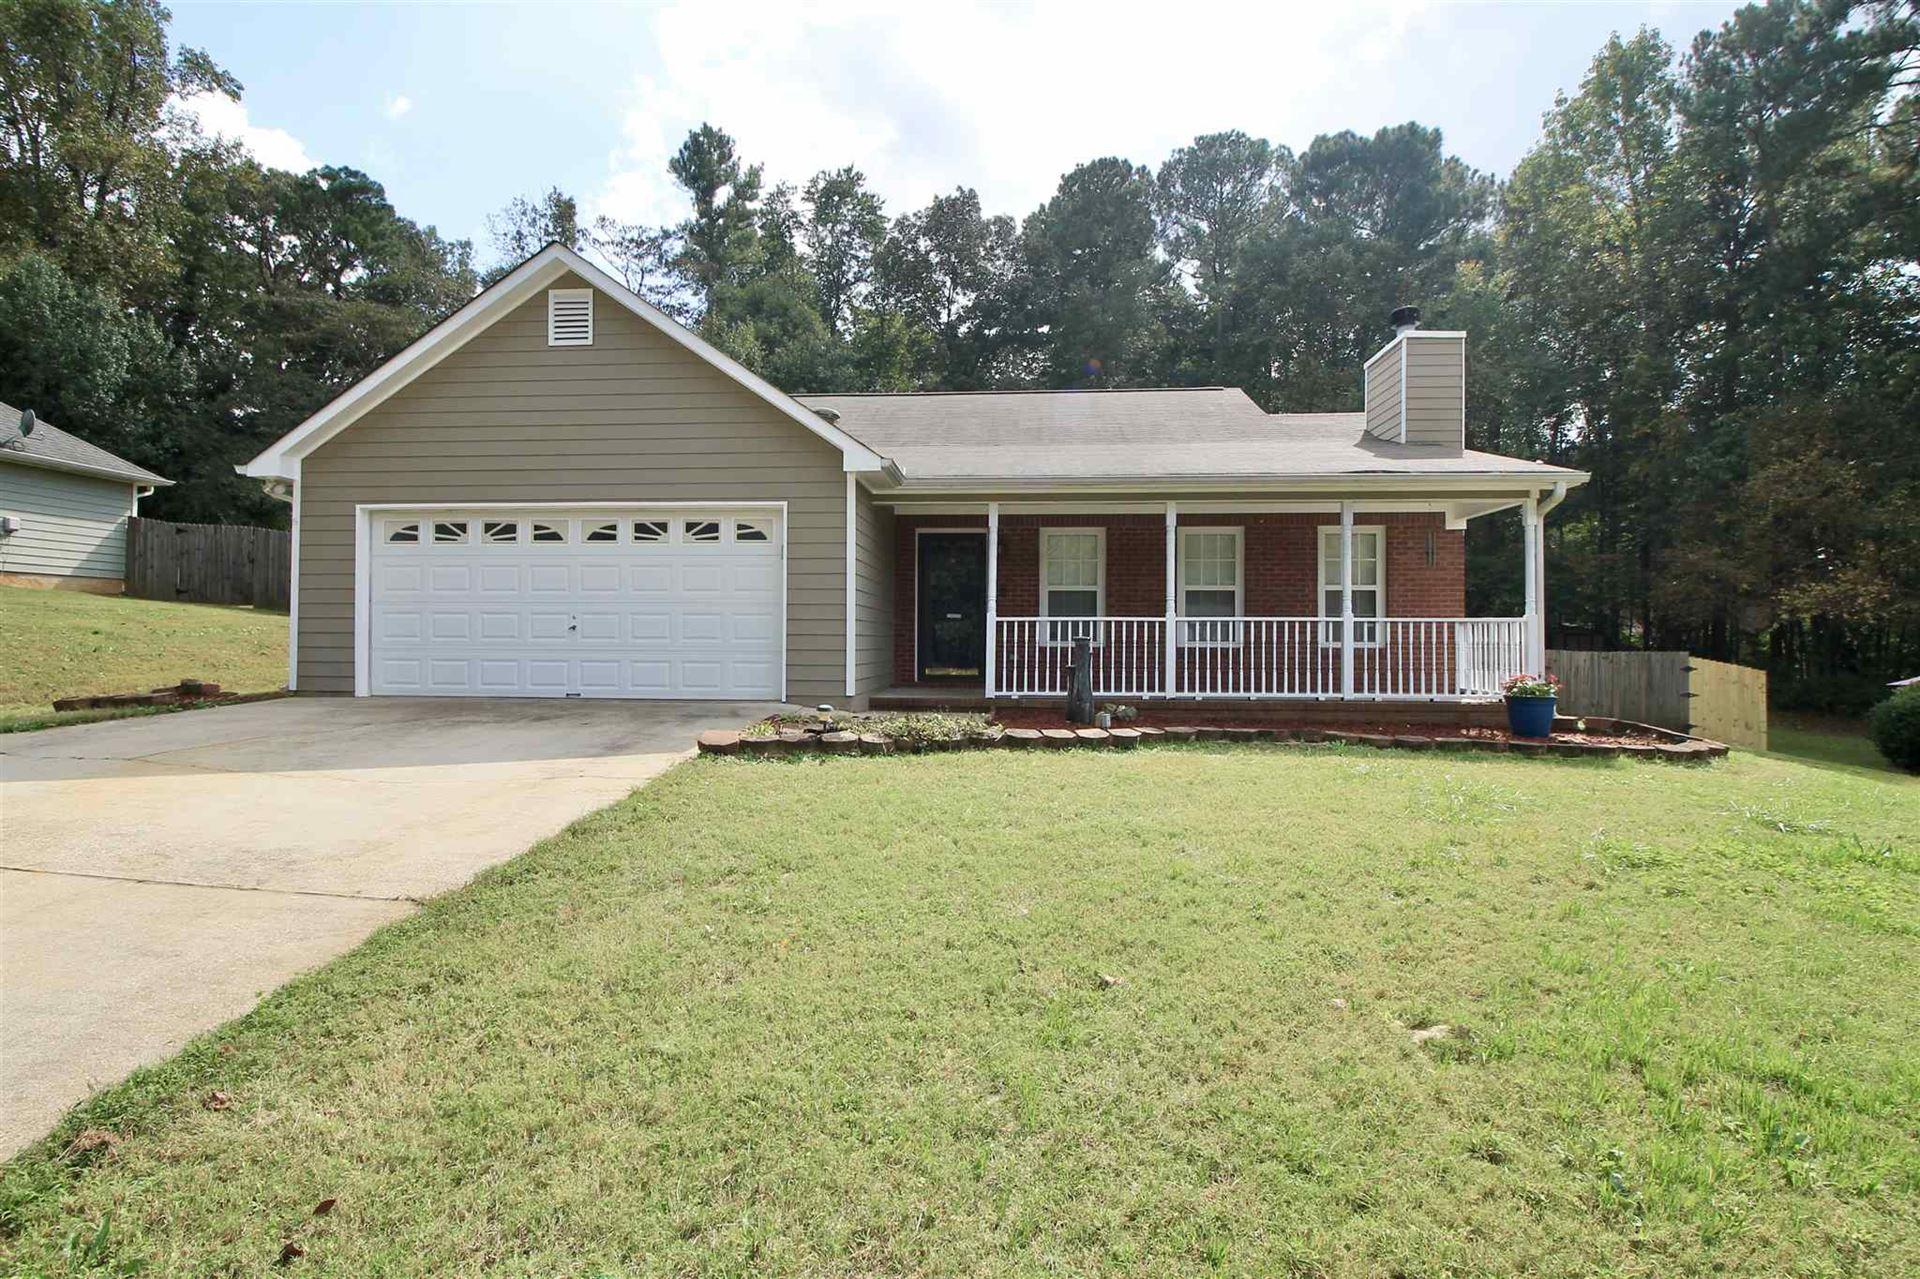 452 Grove Hill Dr, Stockbridge, GA 30281 - MLS#: 8875119